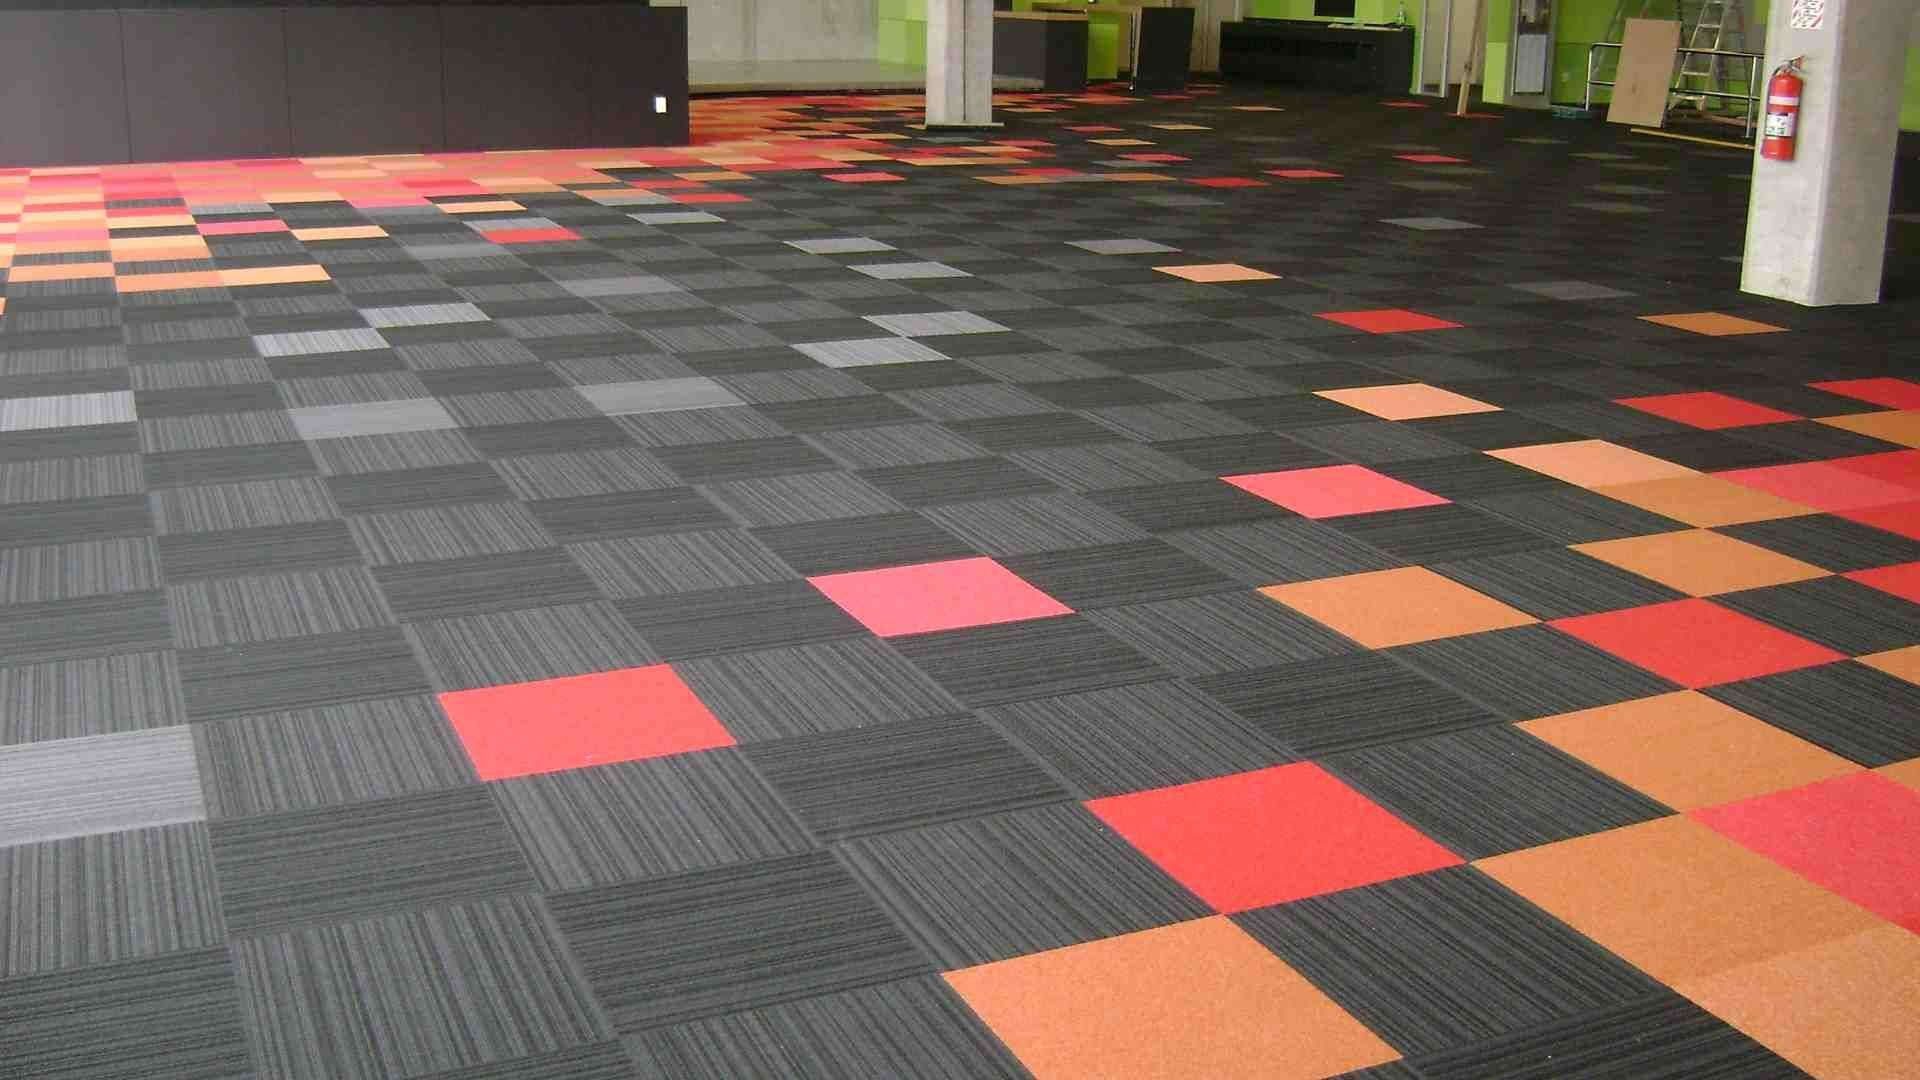 38 Fine Creative Flooring Inspiration Decornish Dot Com Carpet Tiles Modular Carpet Tiles Carpet Tiles Design